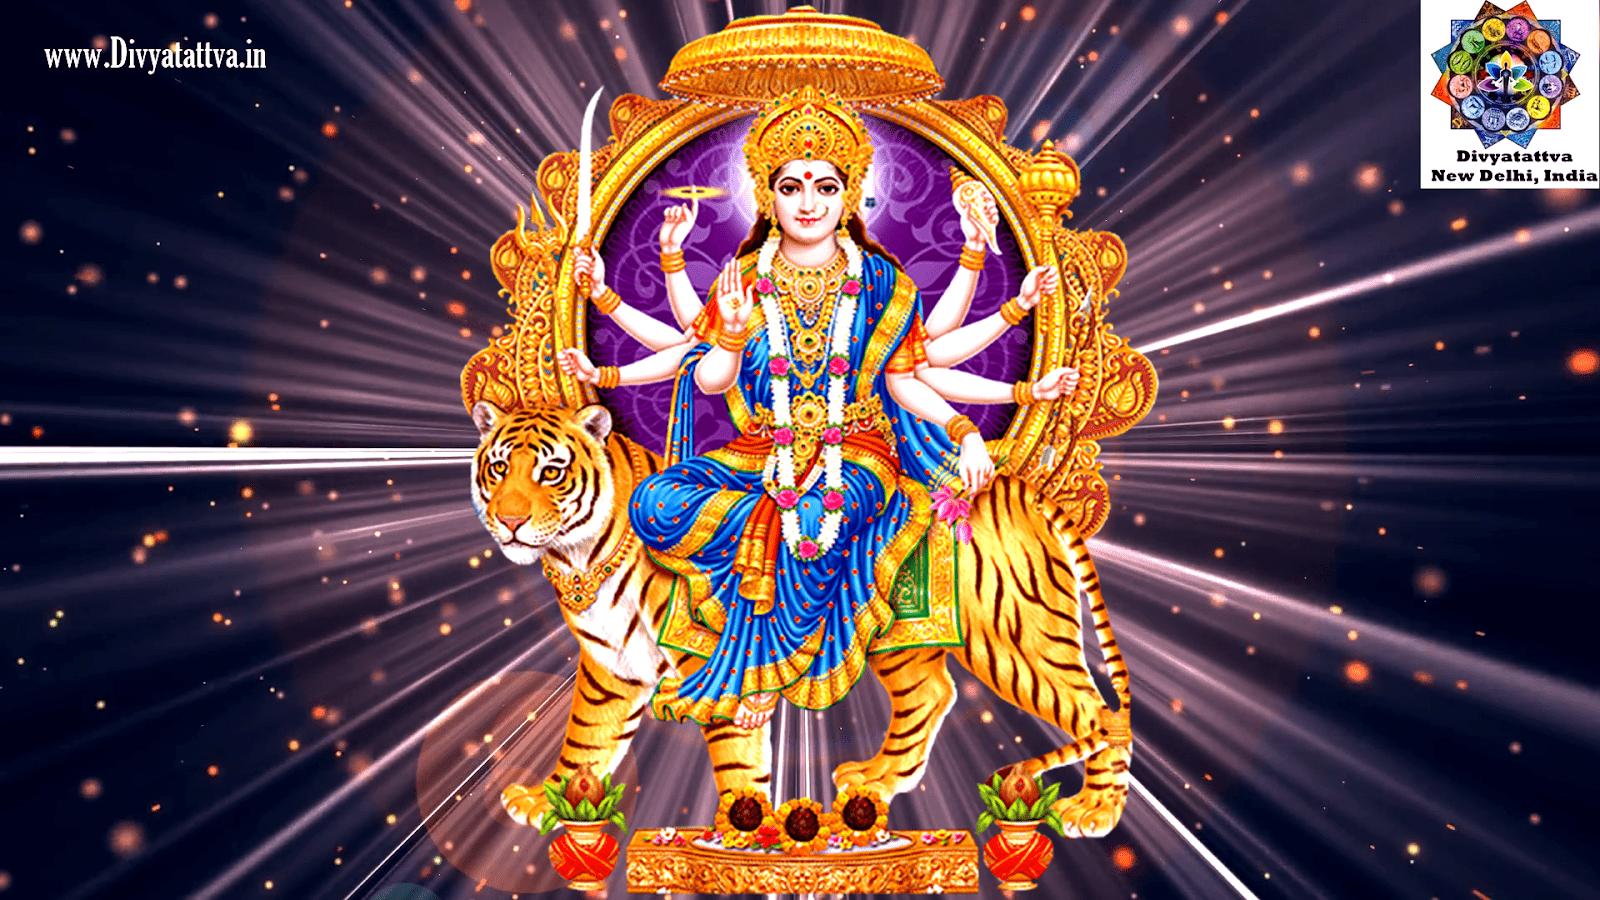 Maa Durga Wallpapers Top Free Maa Durga Backgrounds Wallpaperaccess